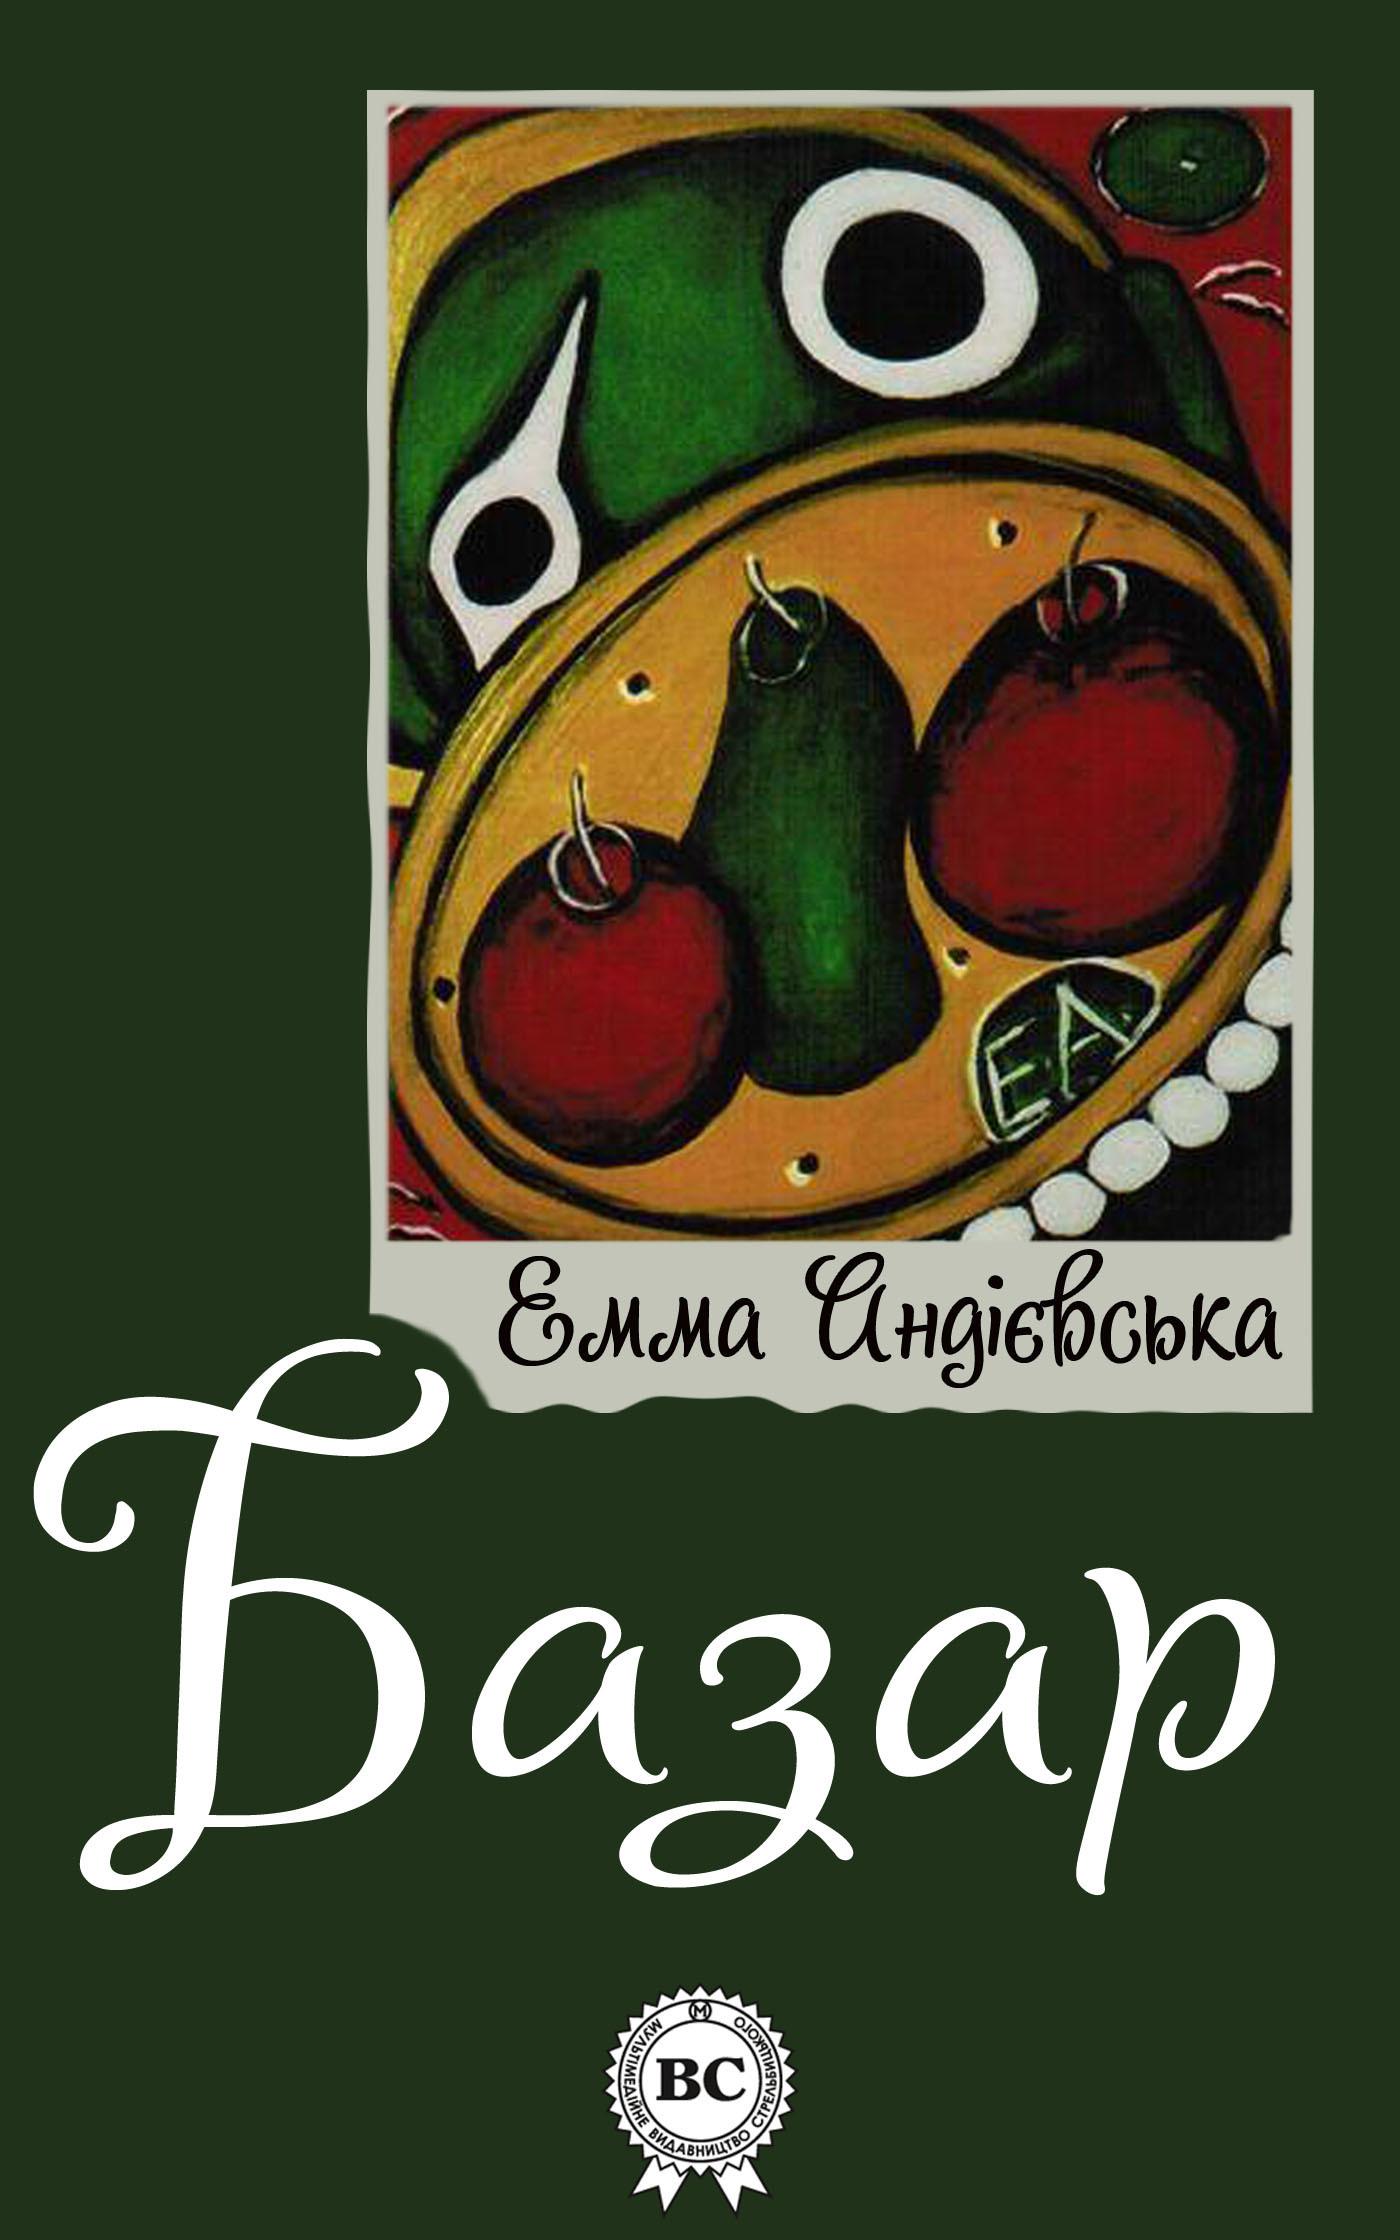 Емма Андієвська Базар пошел козел на базар